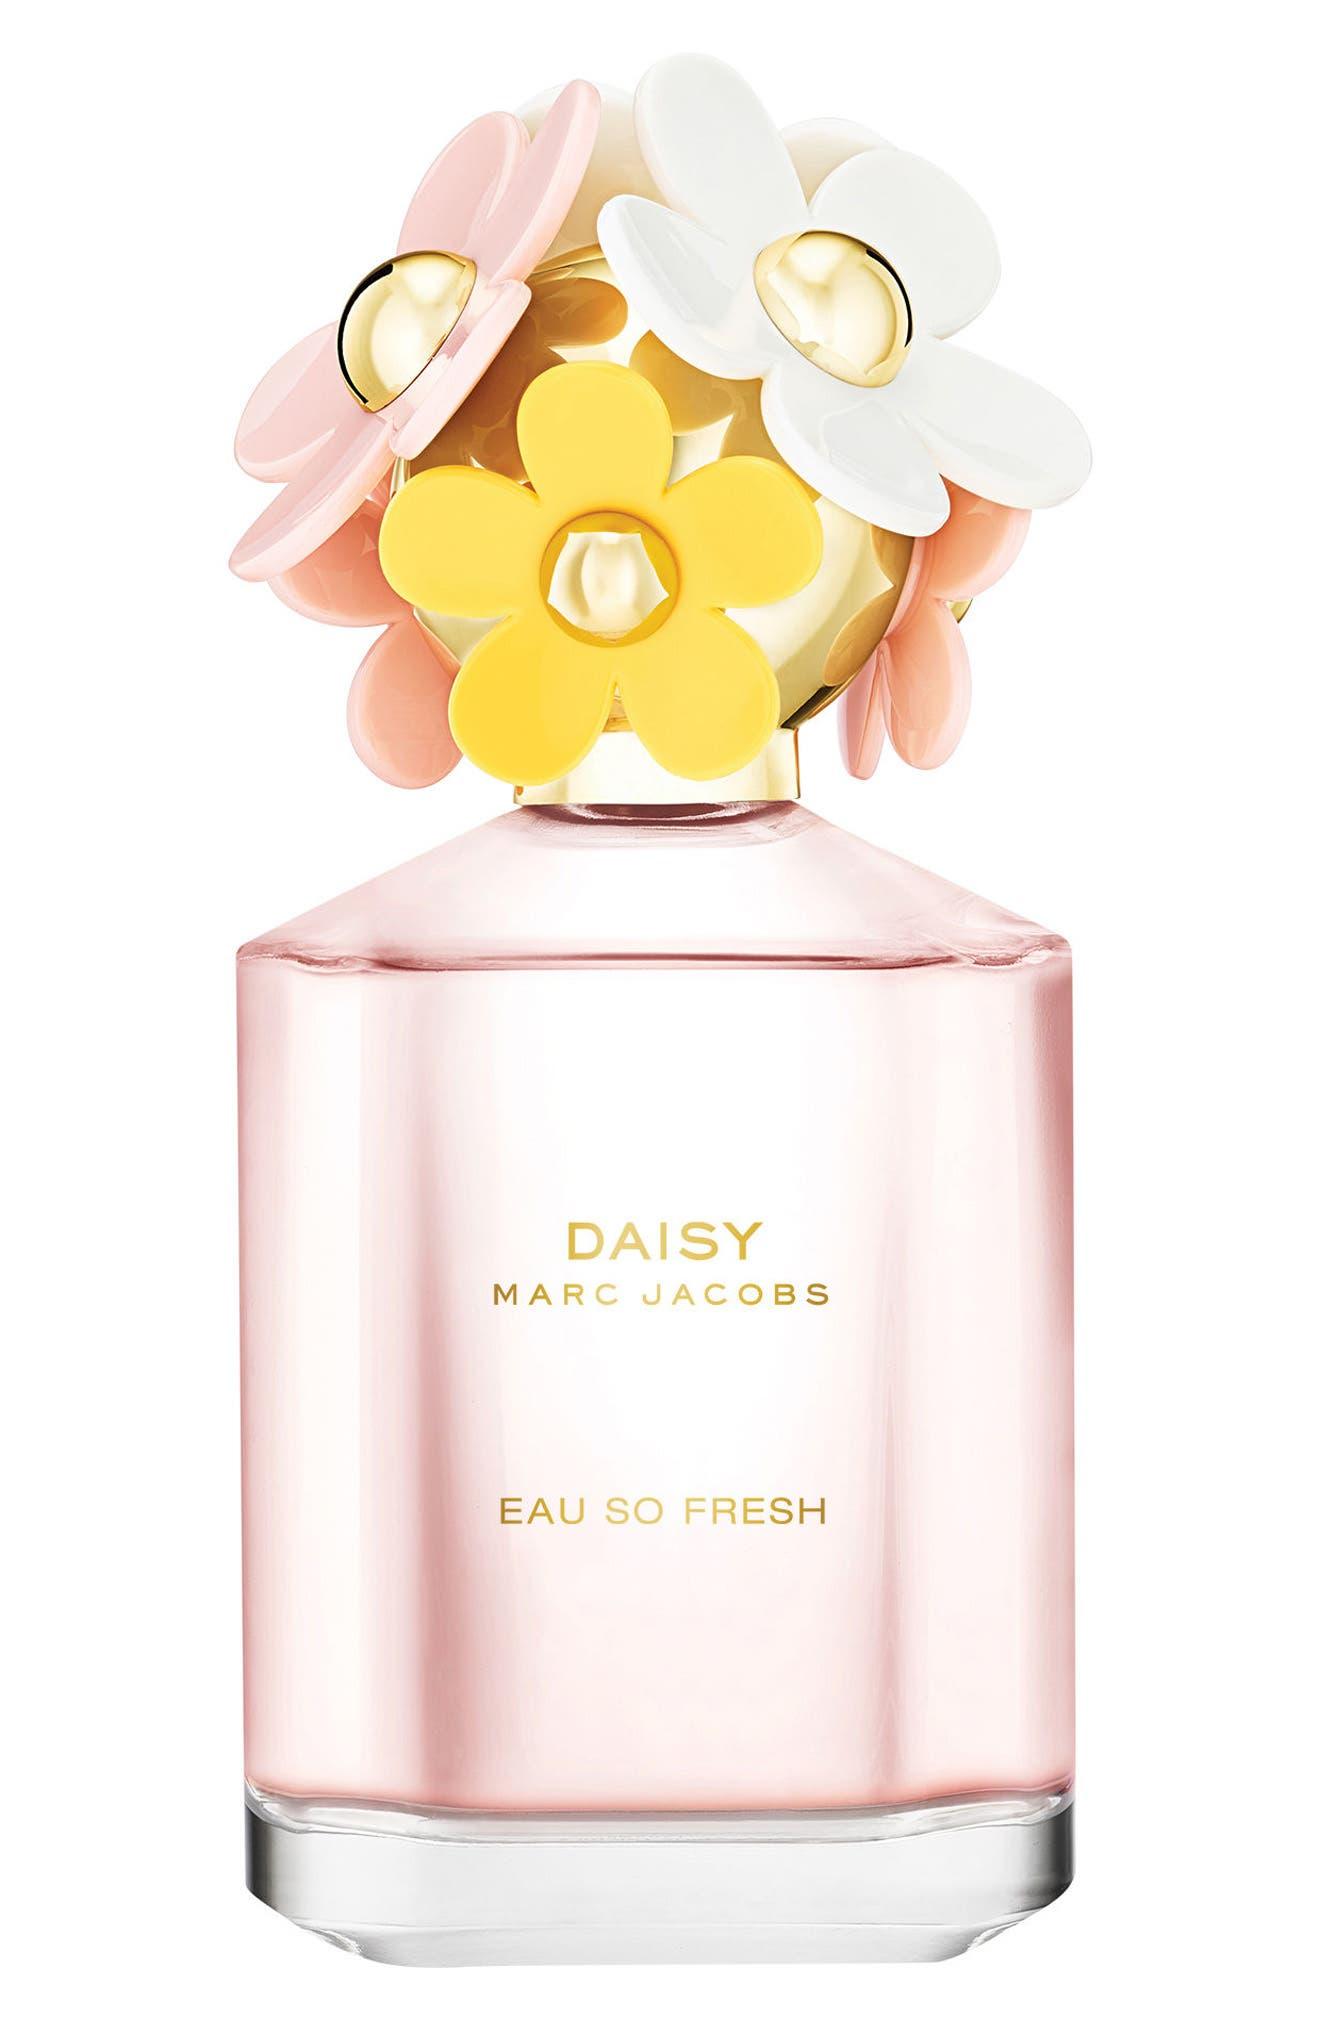 Marc jacobs perfume daisy more nordstrom izmirmasajfo